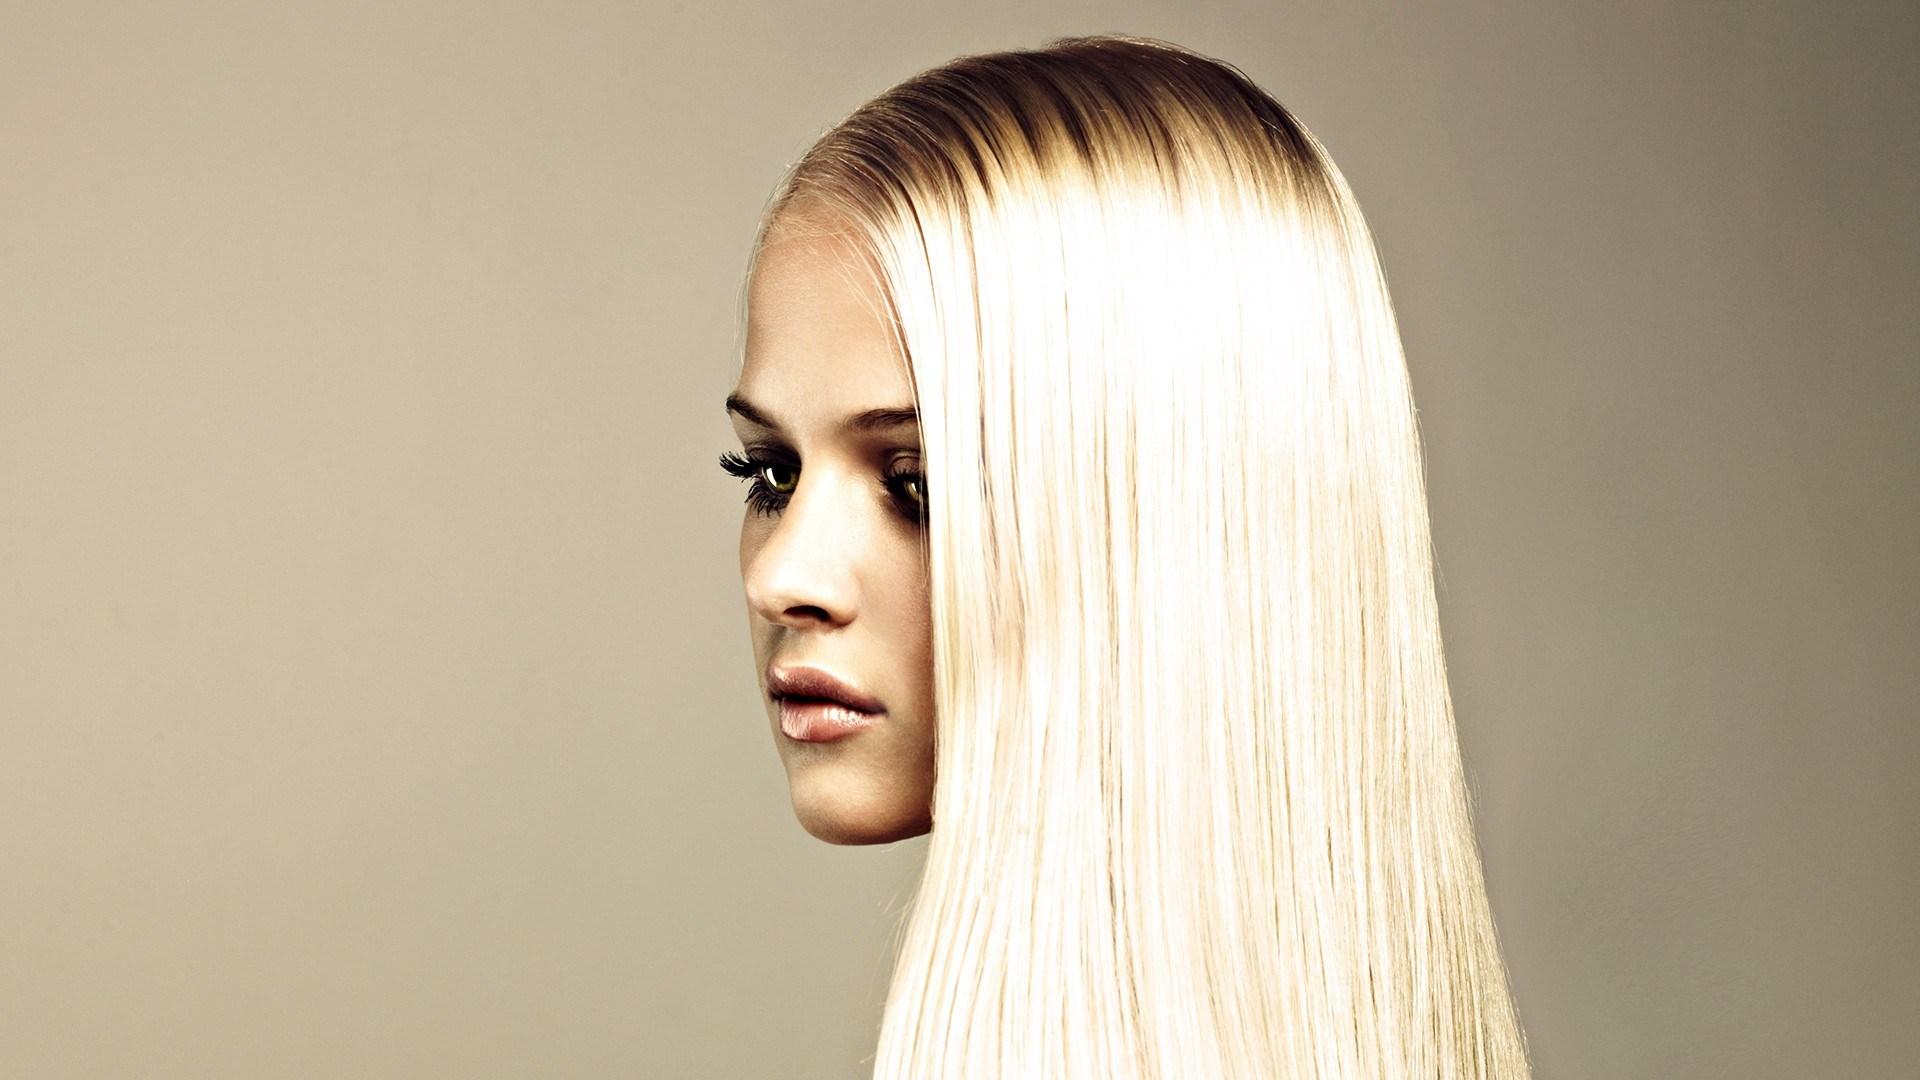 Fashion Photography Beauty Blonde Girl Model Portrait